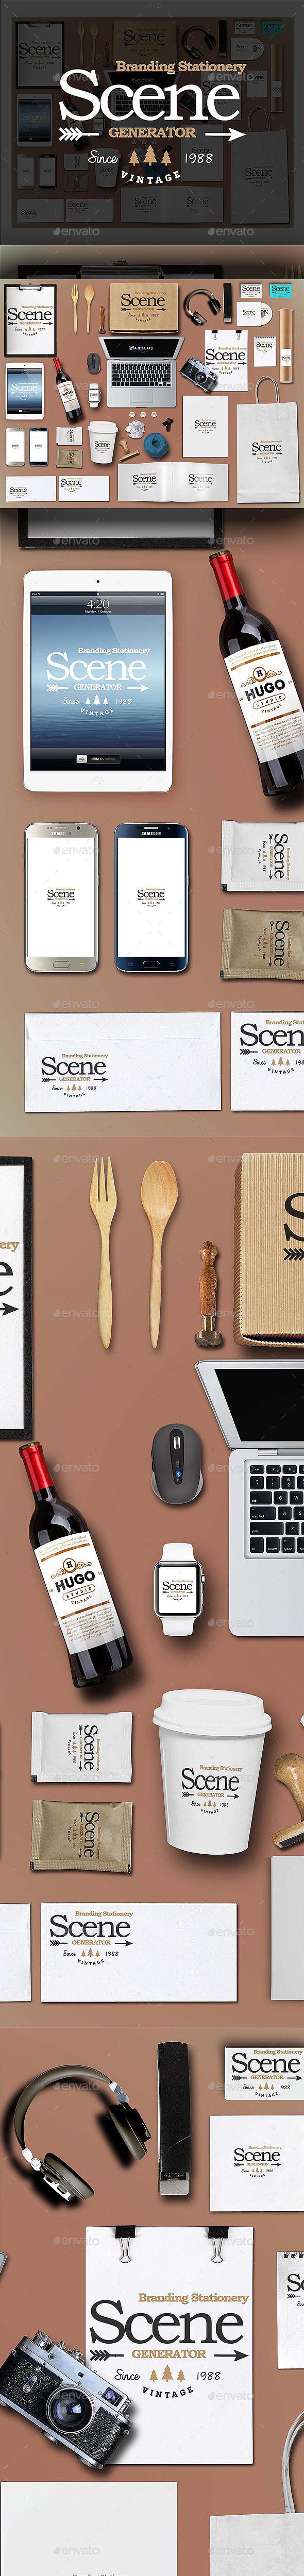 Branding Stationery Scene Generator - Stationery Print